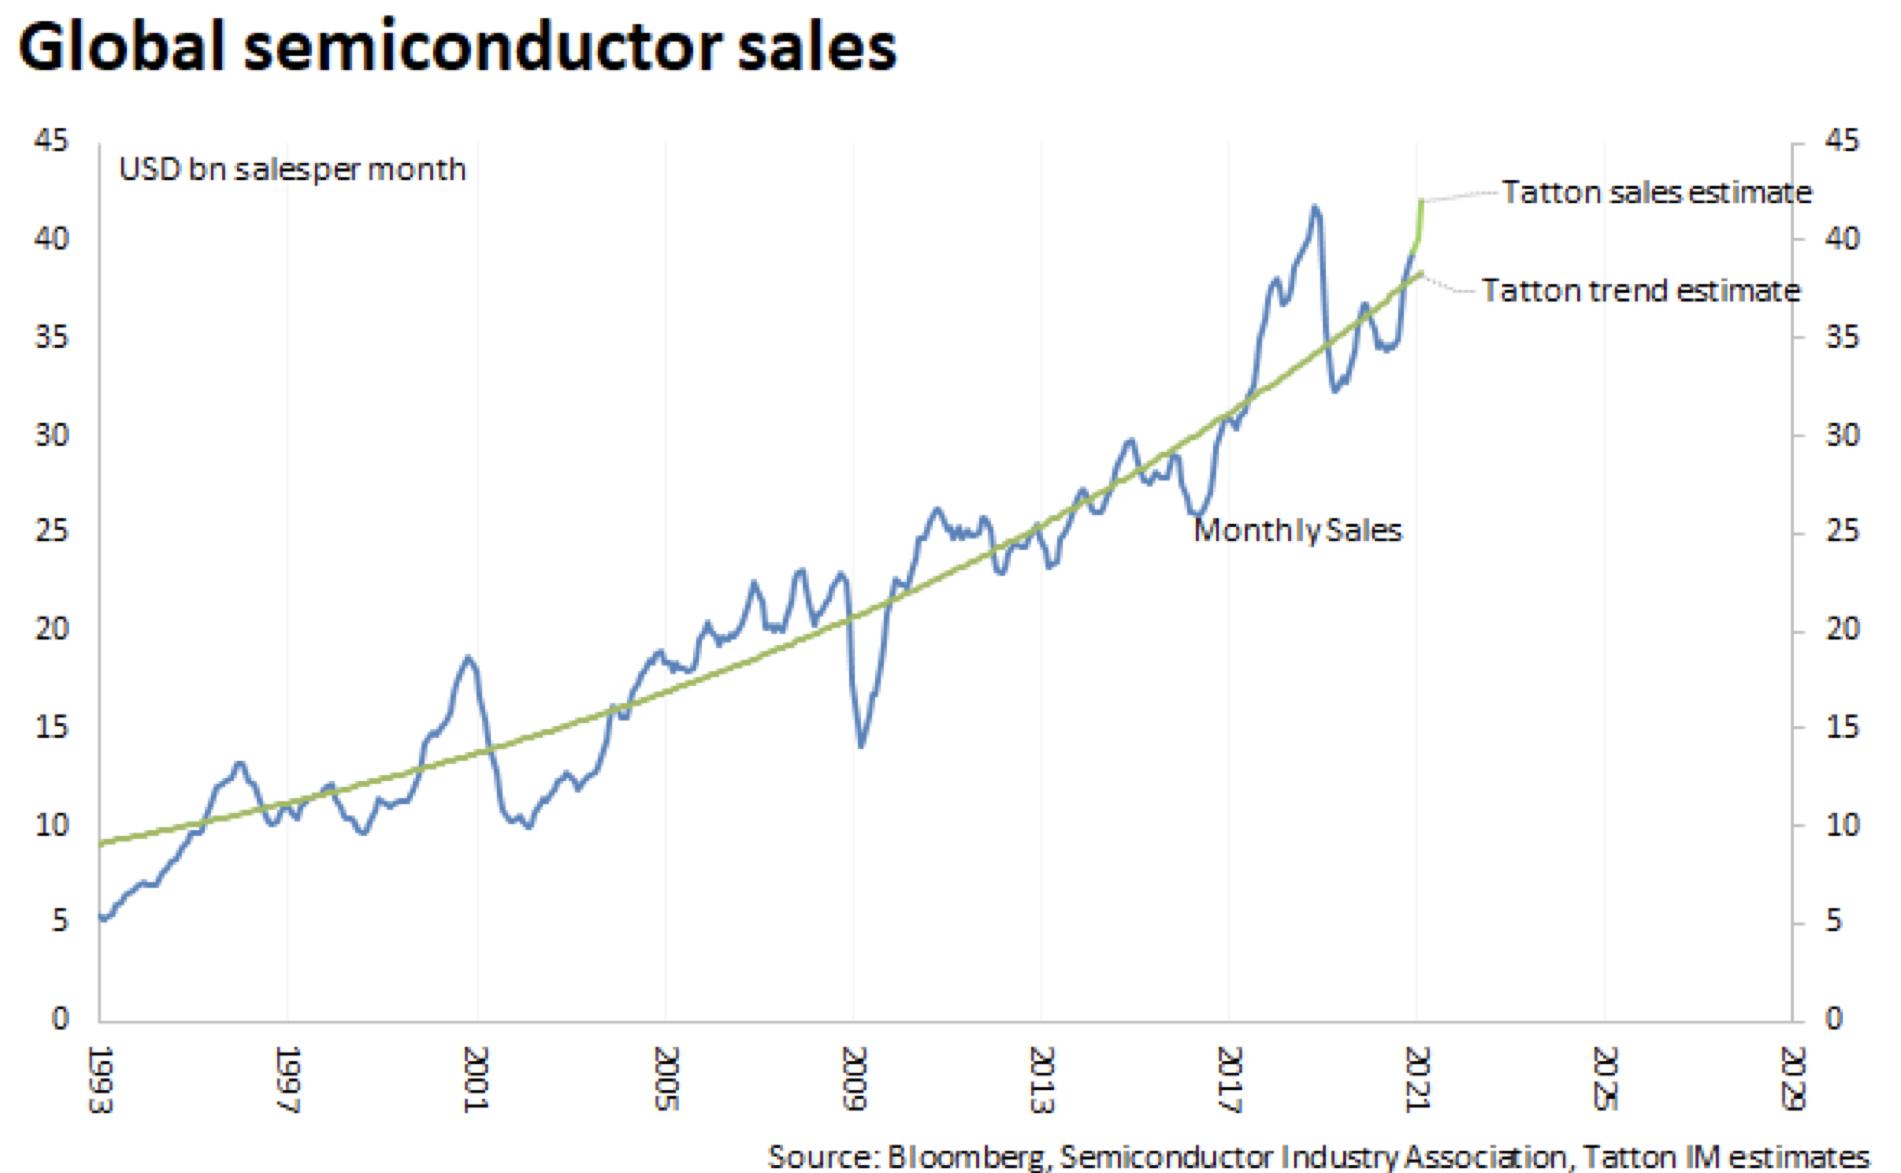 Global semiconductor sales